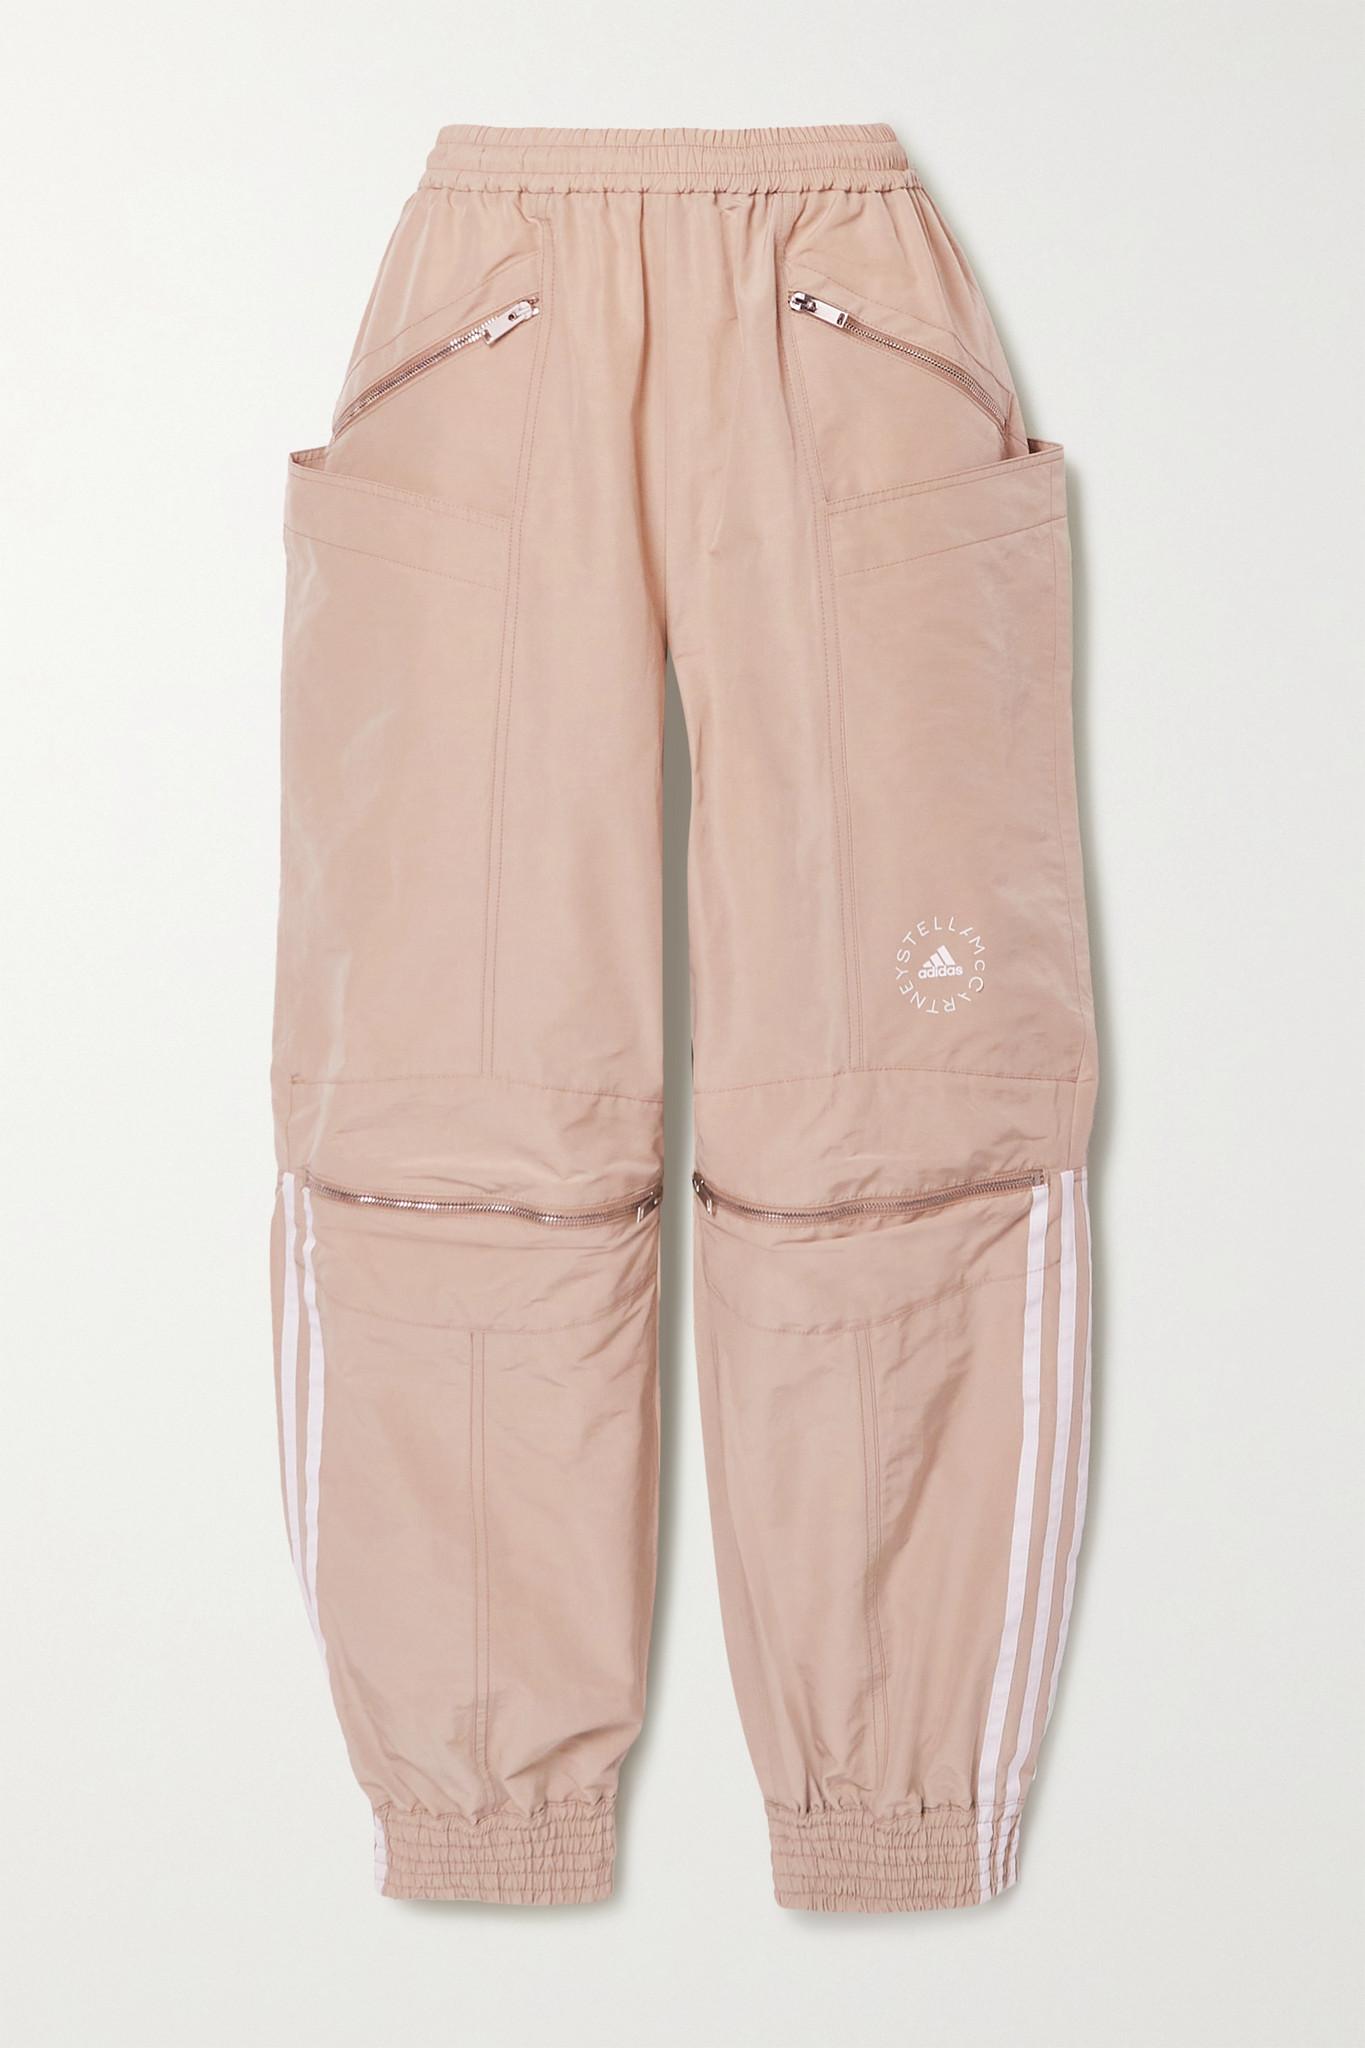 STELLA MCCARTNEY - X Adidas Originals 条纹软壳面料休闲裤 - 棕色 - IT42